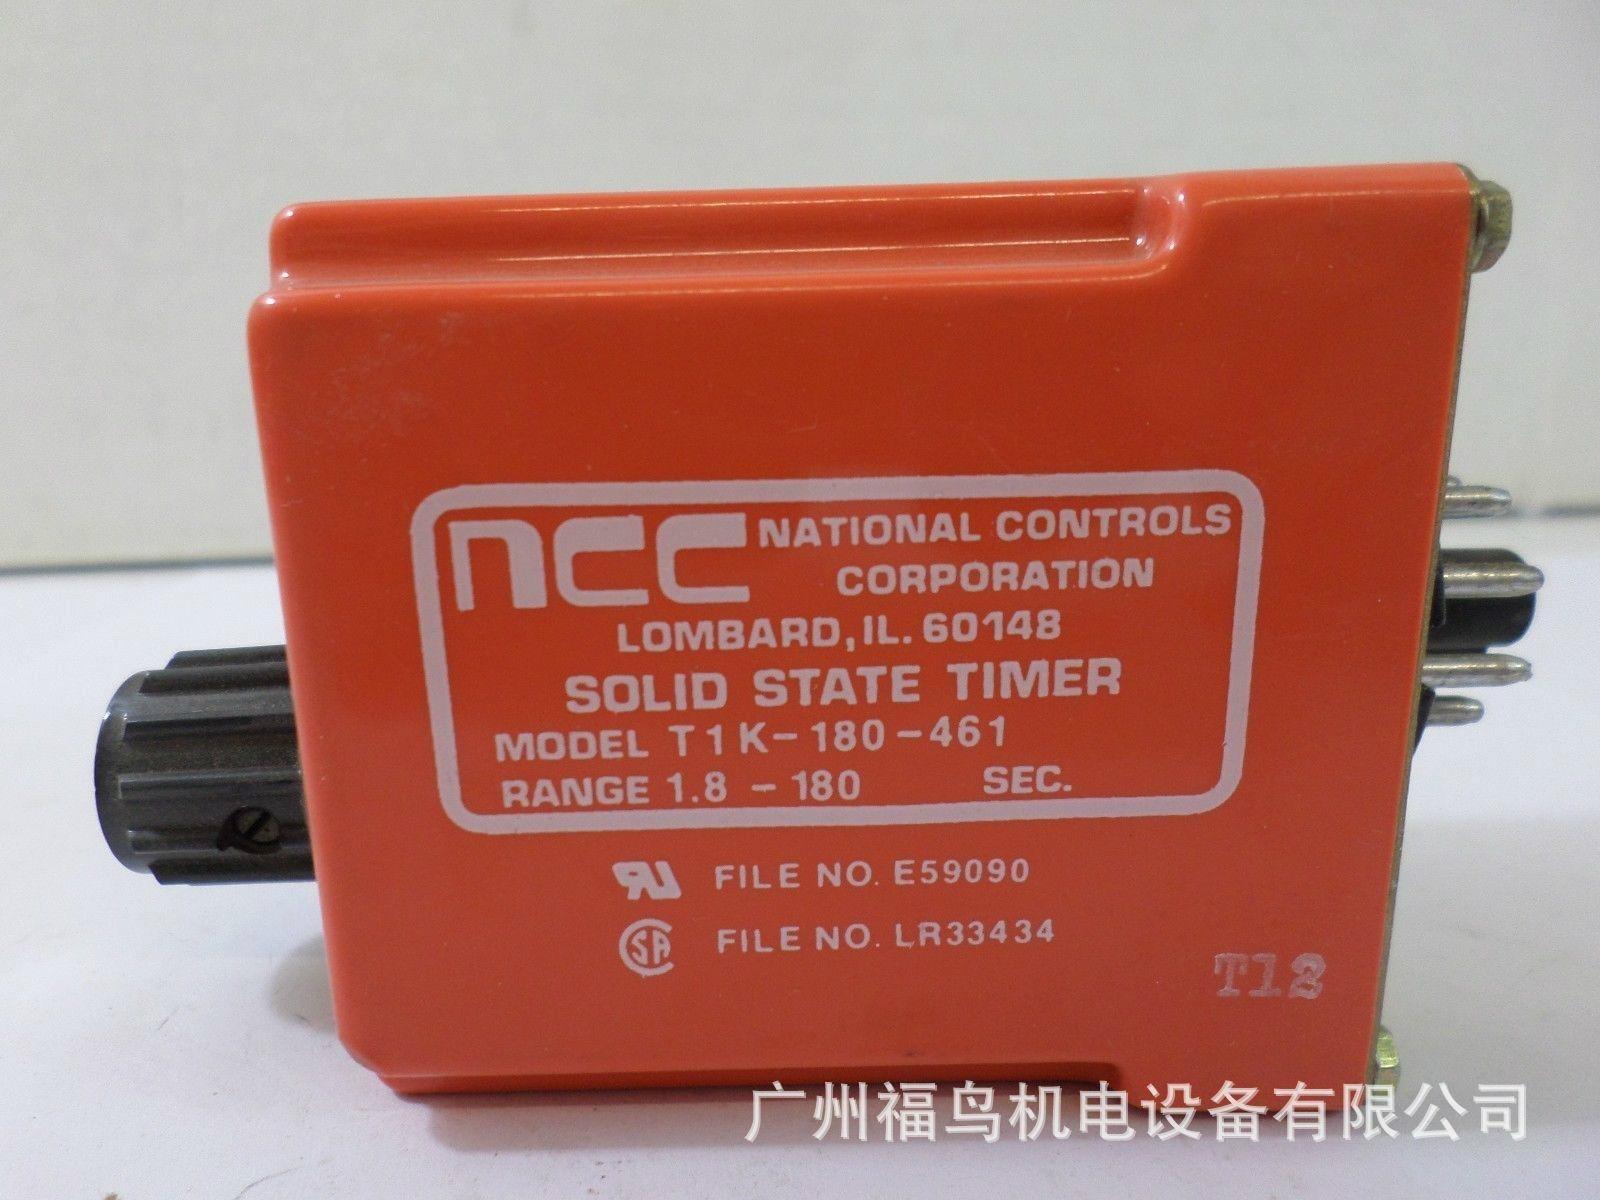 NCC延时继电器, 型号: T1K-180-461